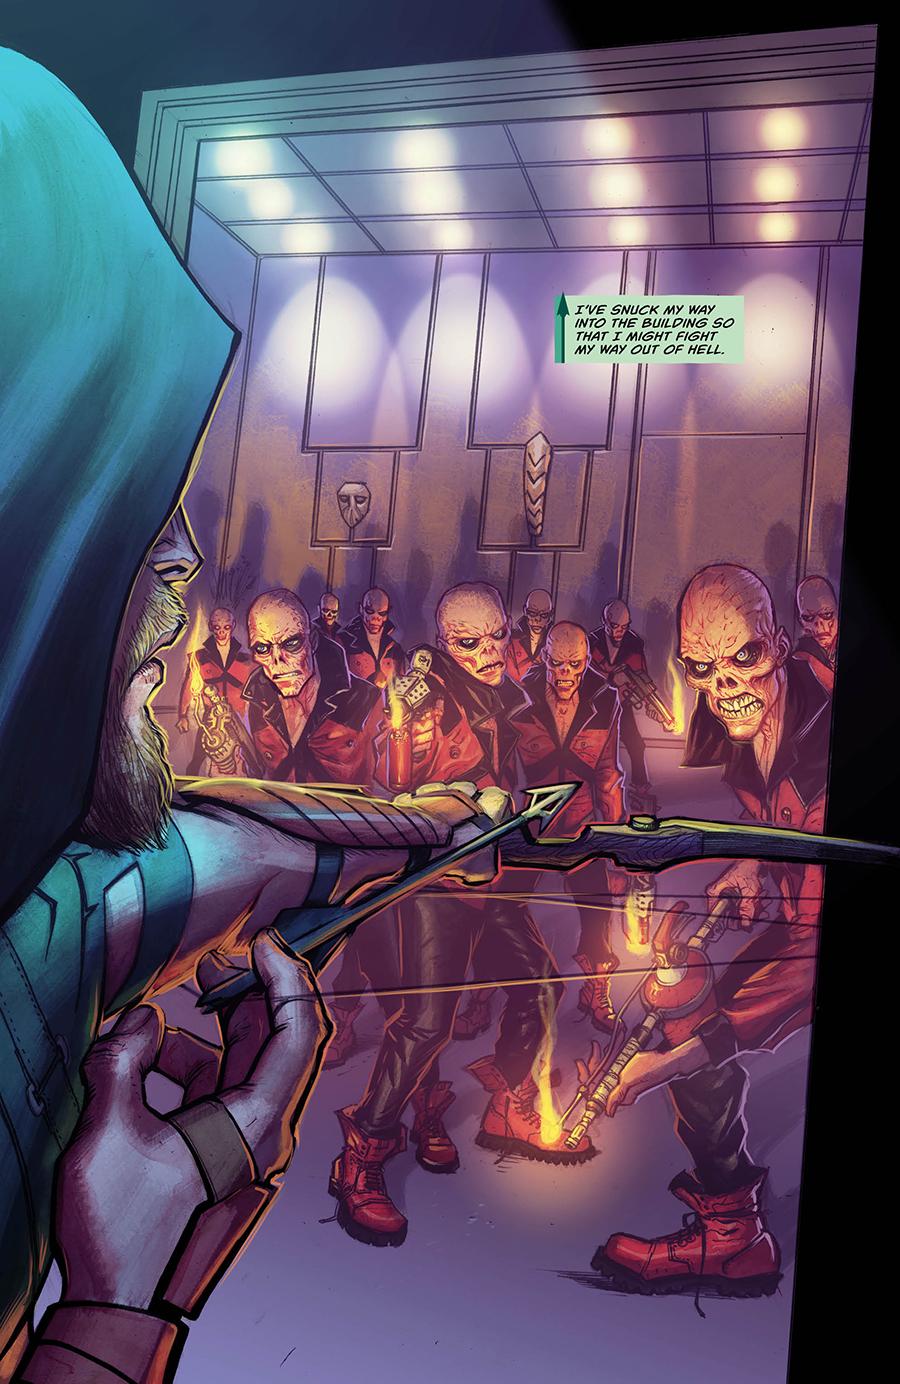 From Green Arrow #3, DC Comics